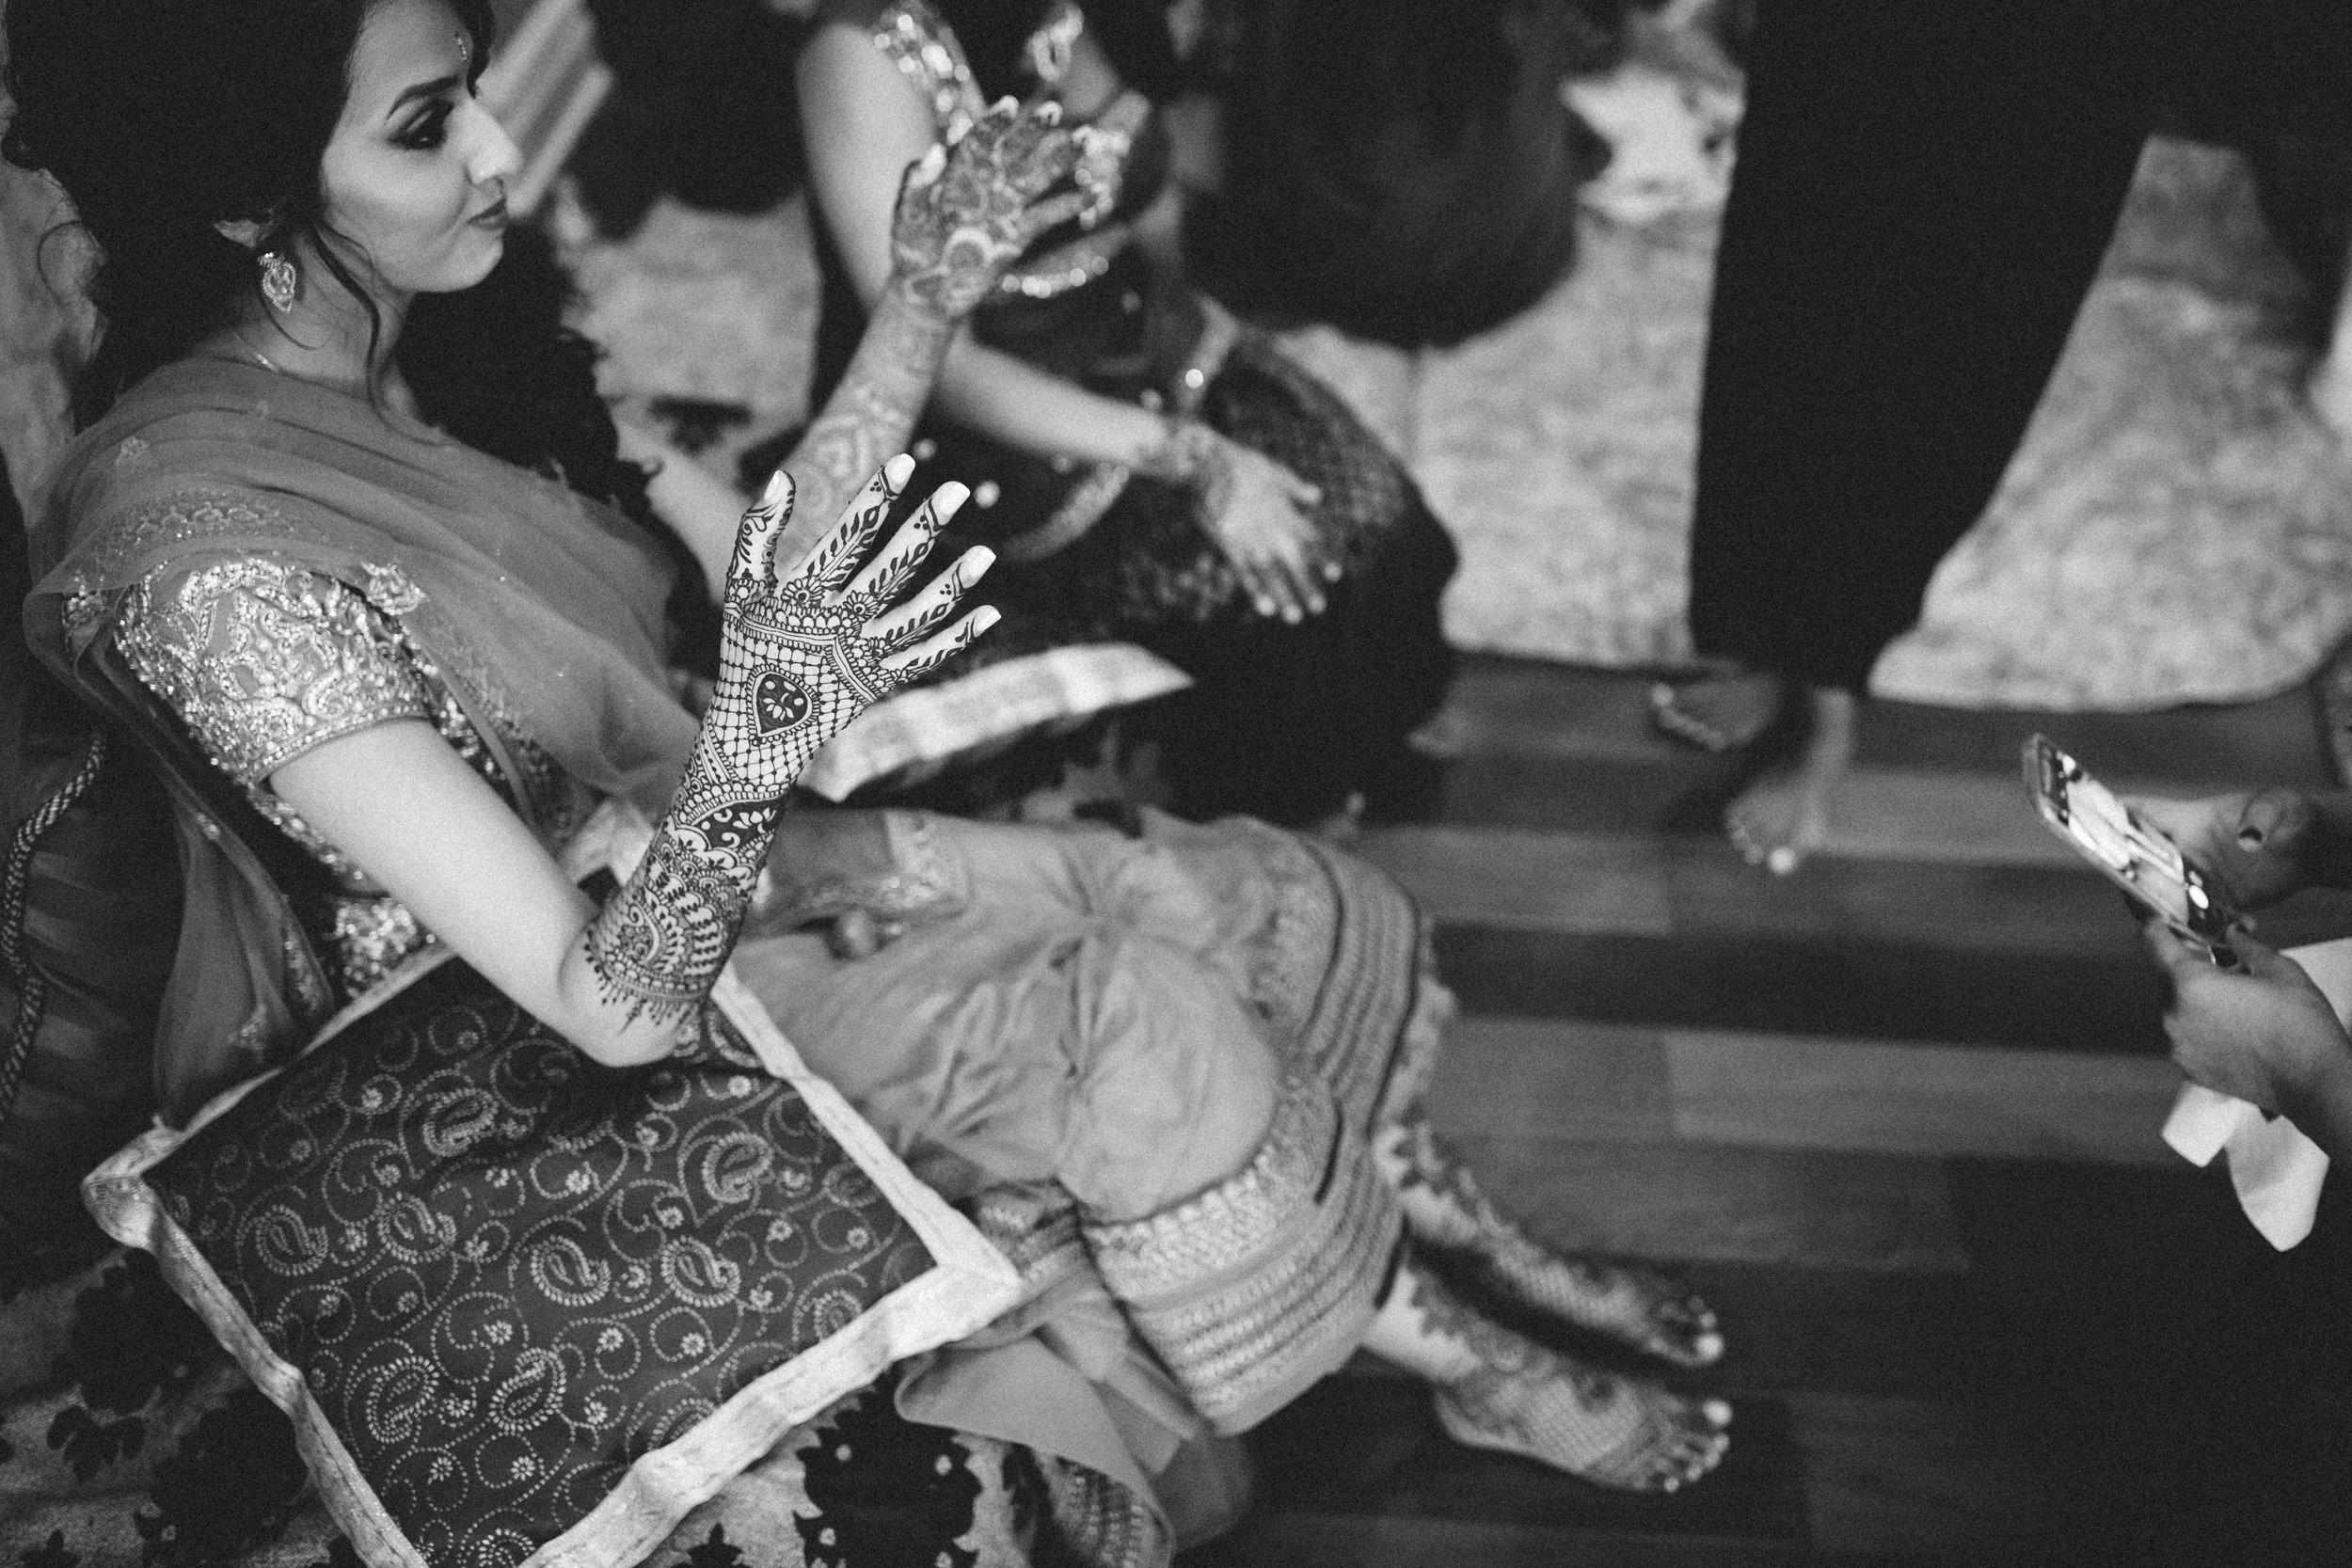 Aparna-Ankit-Patel-Mehndi-Wedding-Photos-0057.jpg